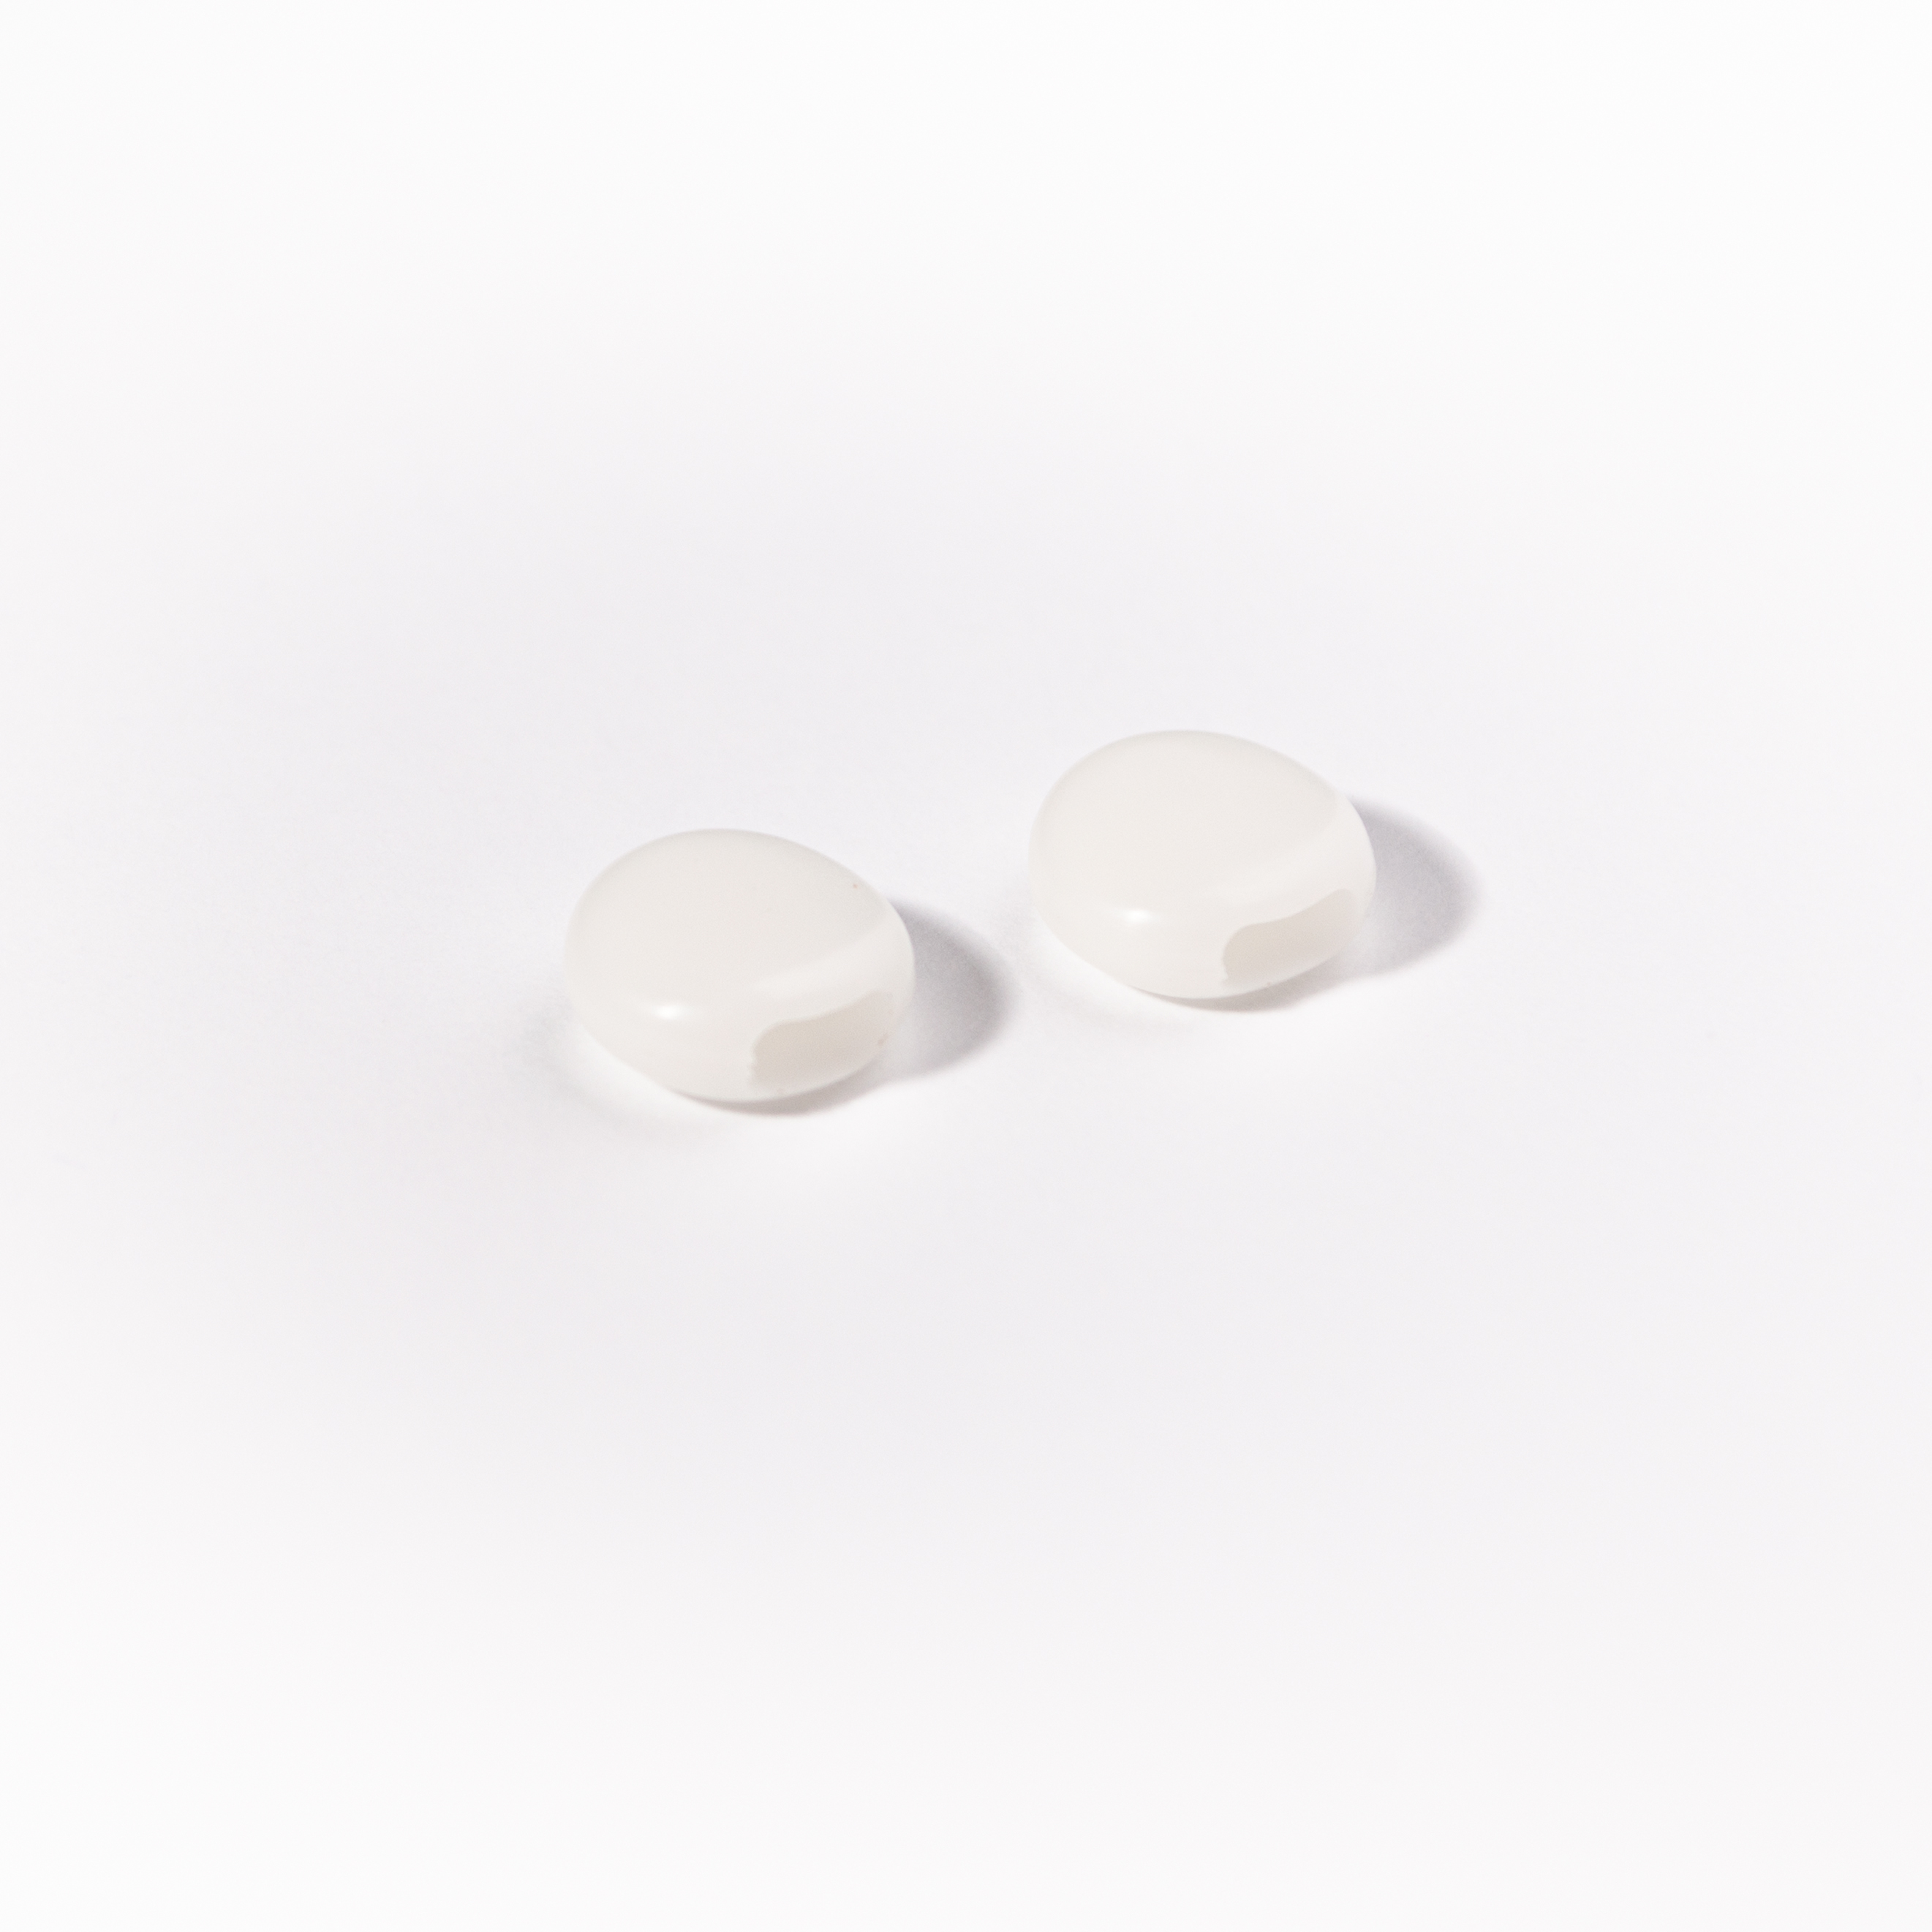 Verstellperlen Paar / Weiß